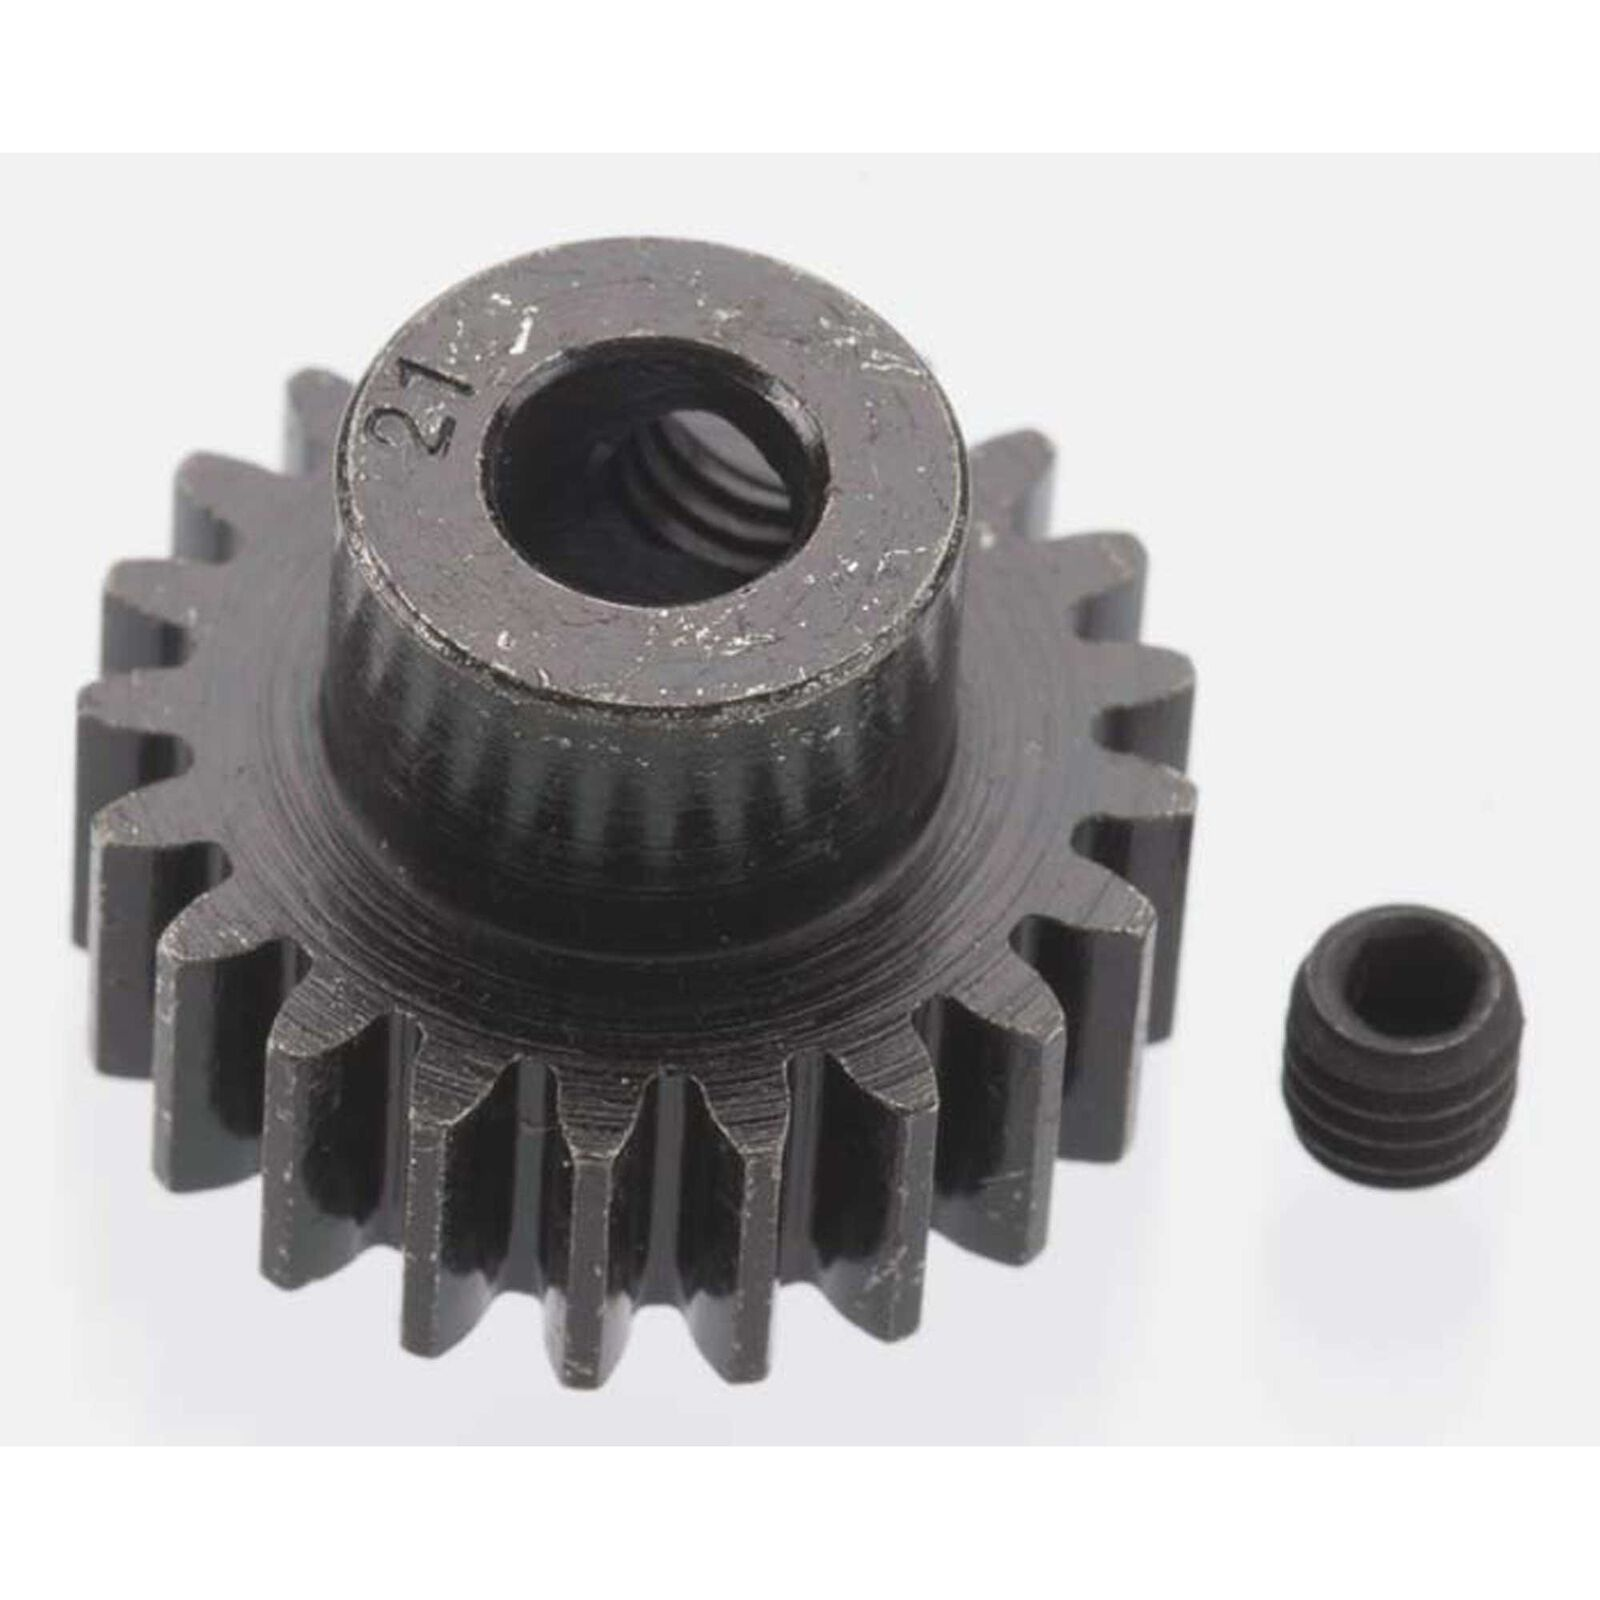 Extra Hard 21 Tooth Blackened Steel 32p Pinion, 5mm